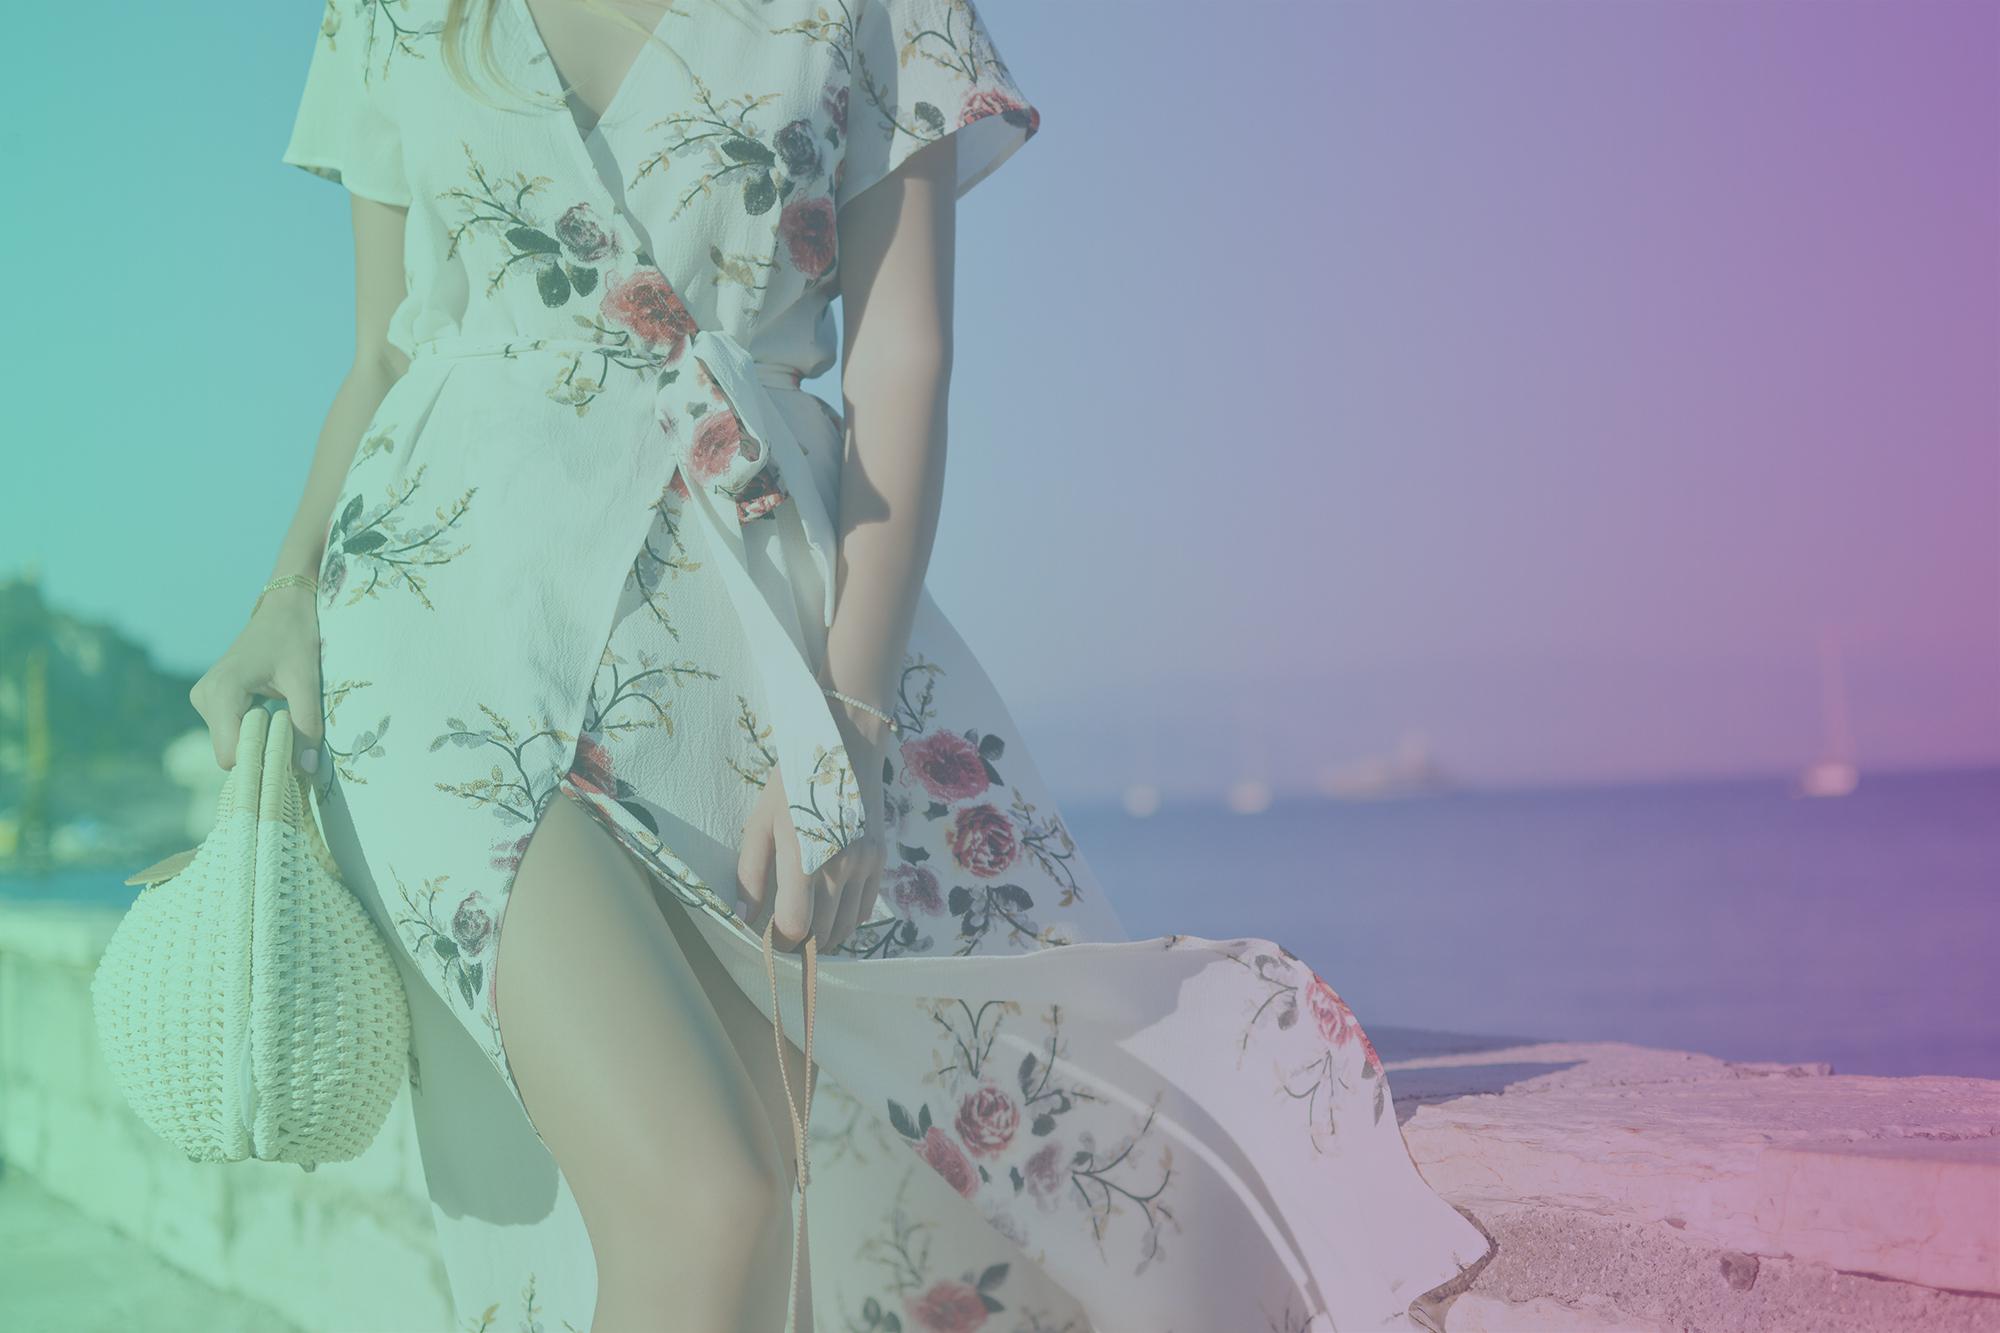 fashion instagram influencers 2020